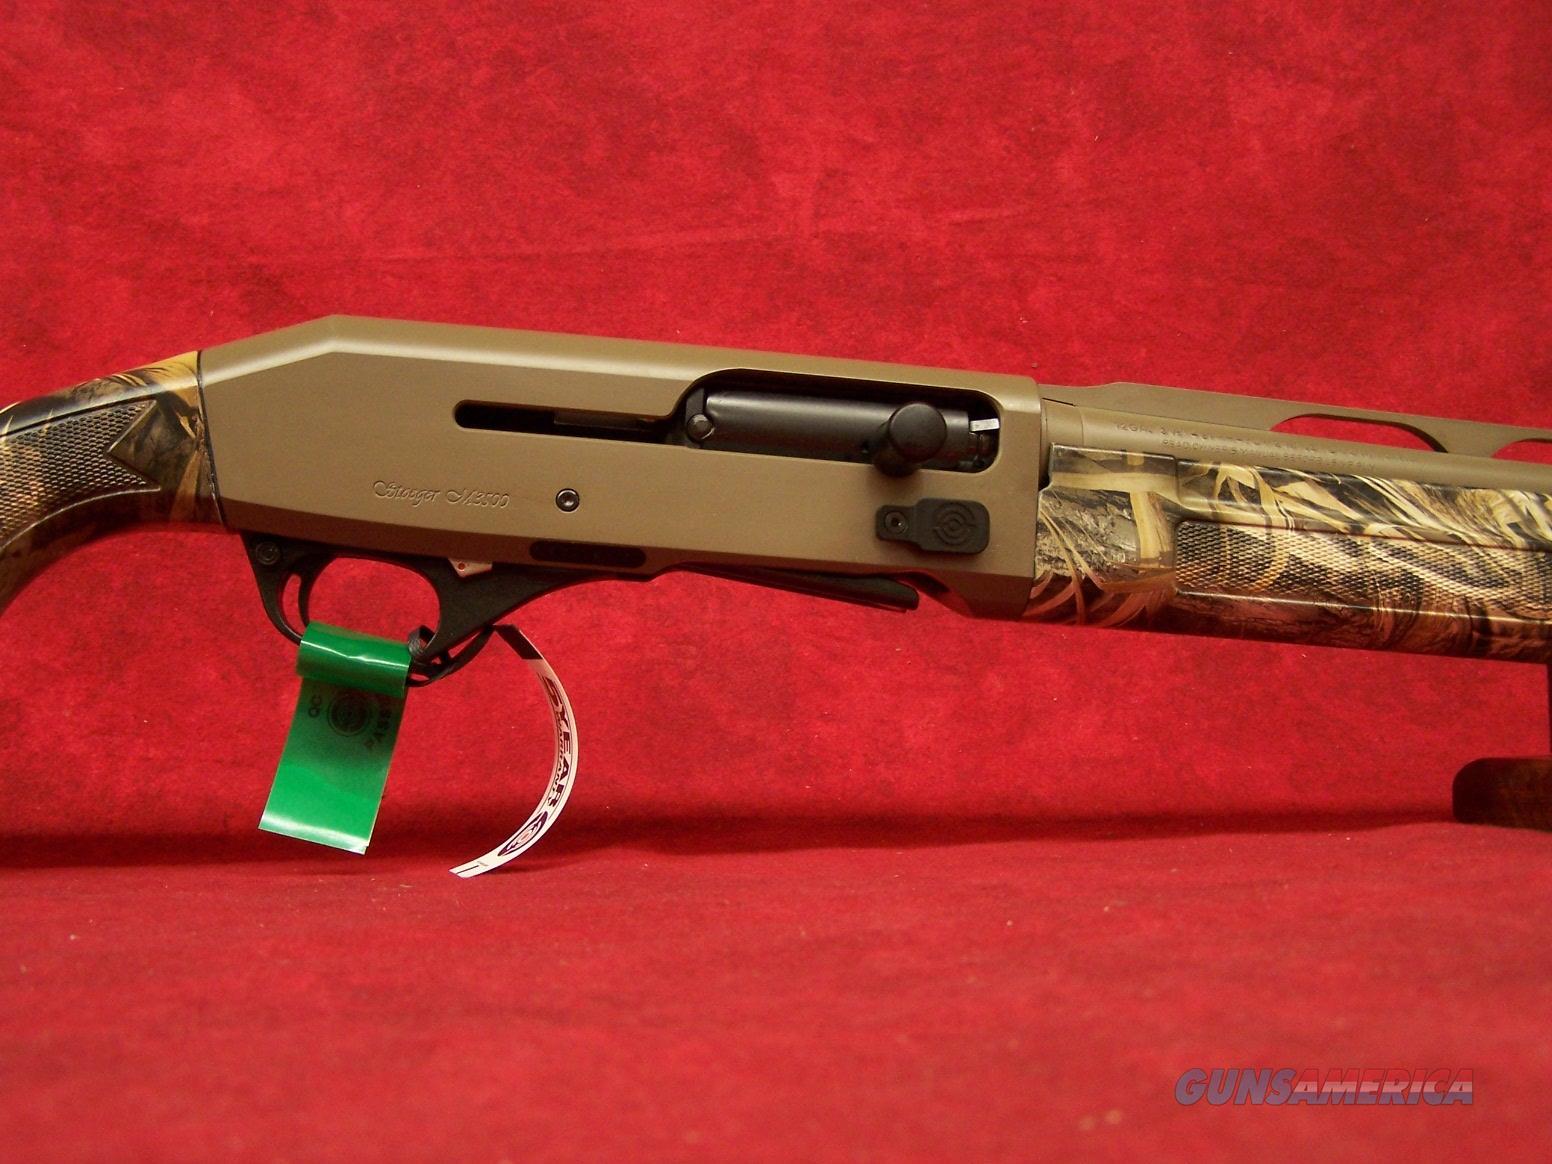 "Stoeger M3500 Waterfowl Special Max 5 Flat Dark Earth Cerakote 12ga 3.5"" Chamber 28"" (31849)  Guns > Shotguns > Stoeger Shotguns"